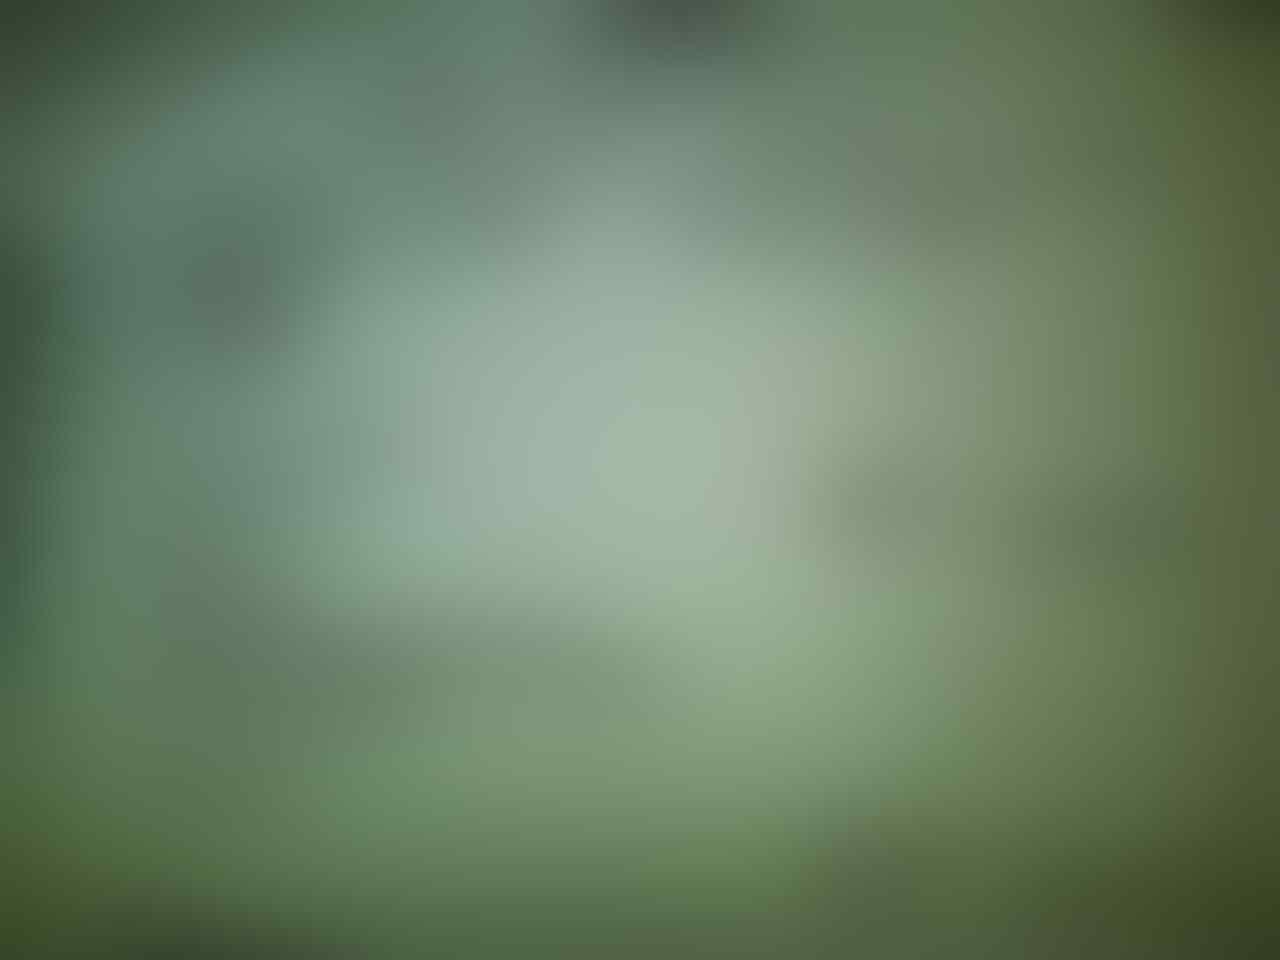 PROMO HOT ITEM !! Motorola Moto G 8Gb Dual Sim New Batangan Hp only Murah abisin stok